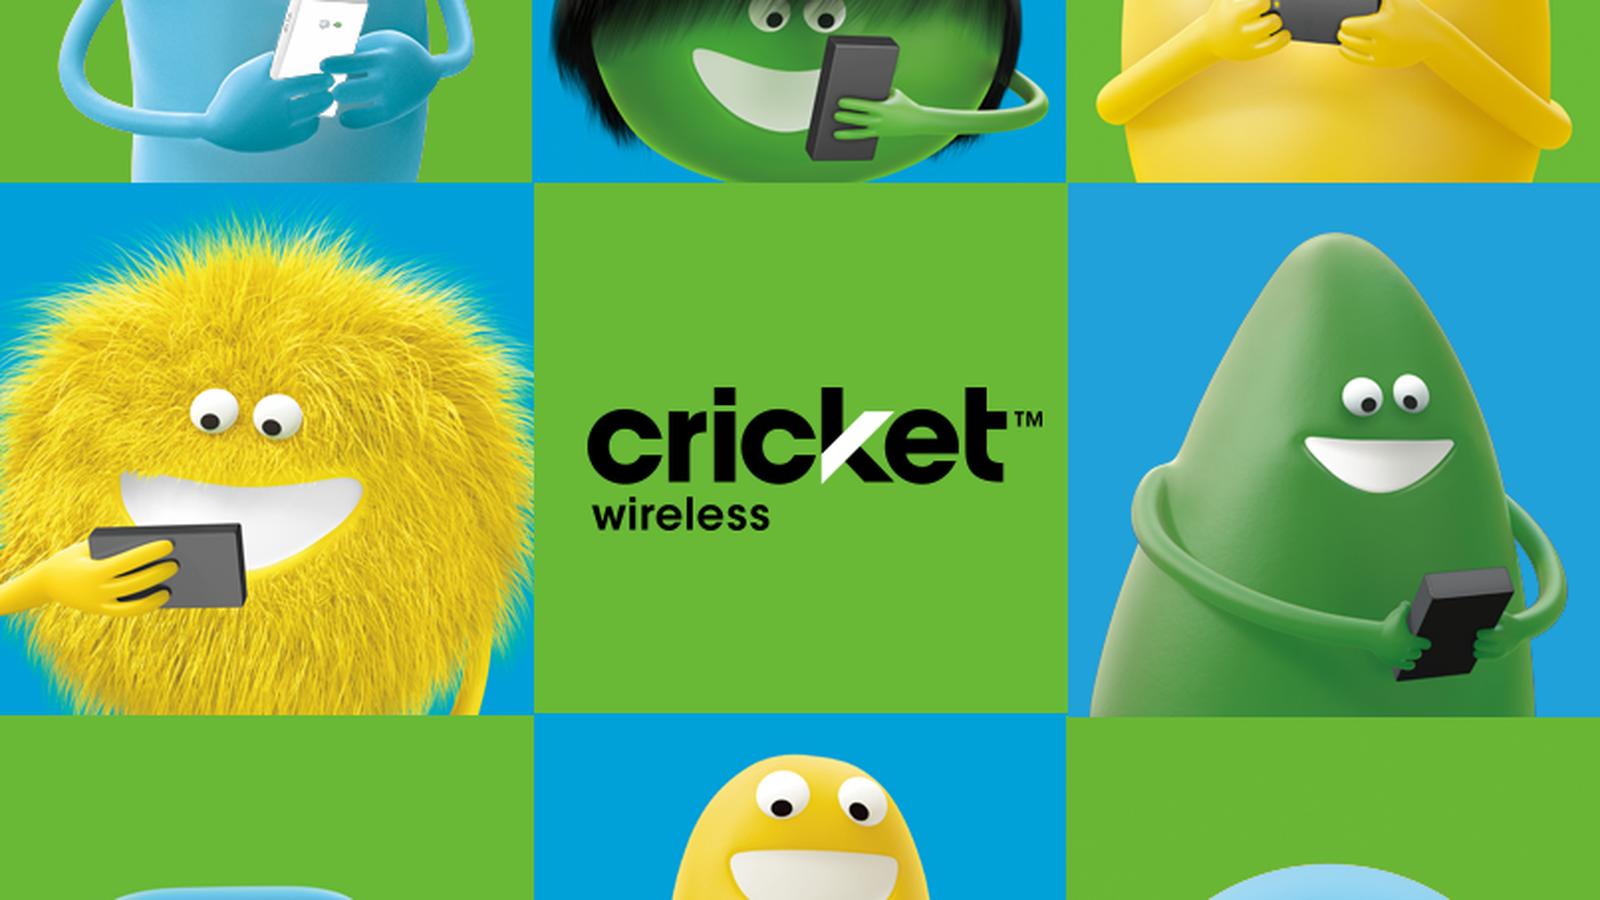 Thatgeekdad Cricket Wireless New Unlimited Data Plan Deal